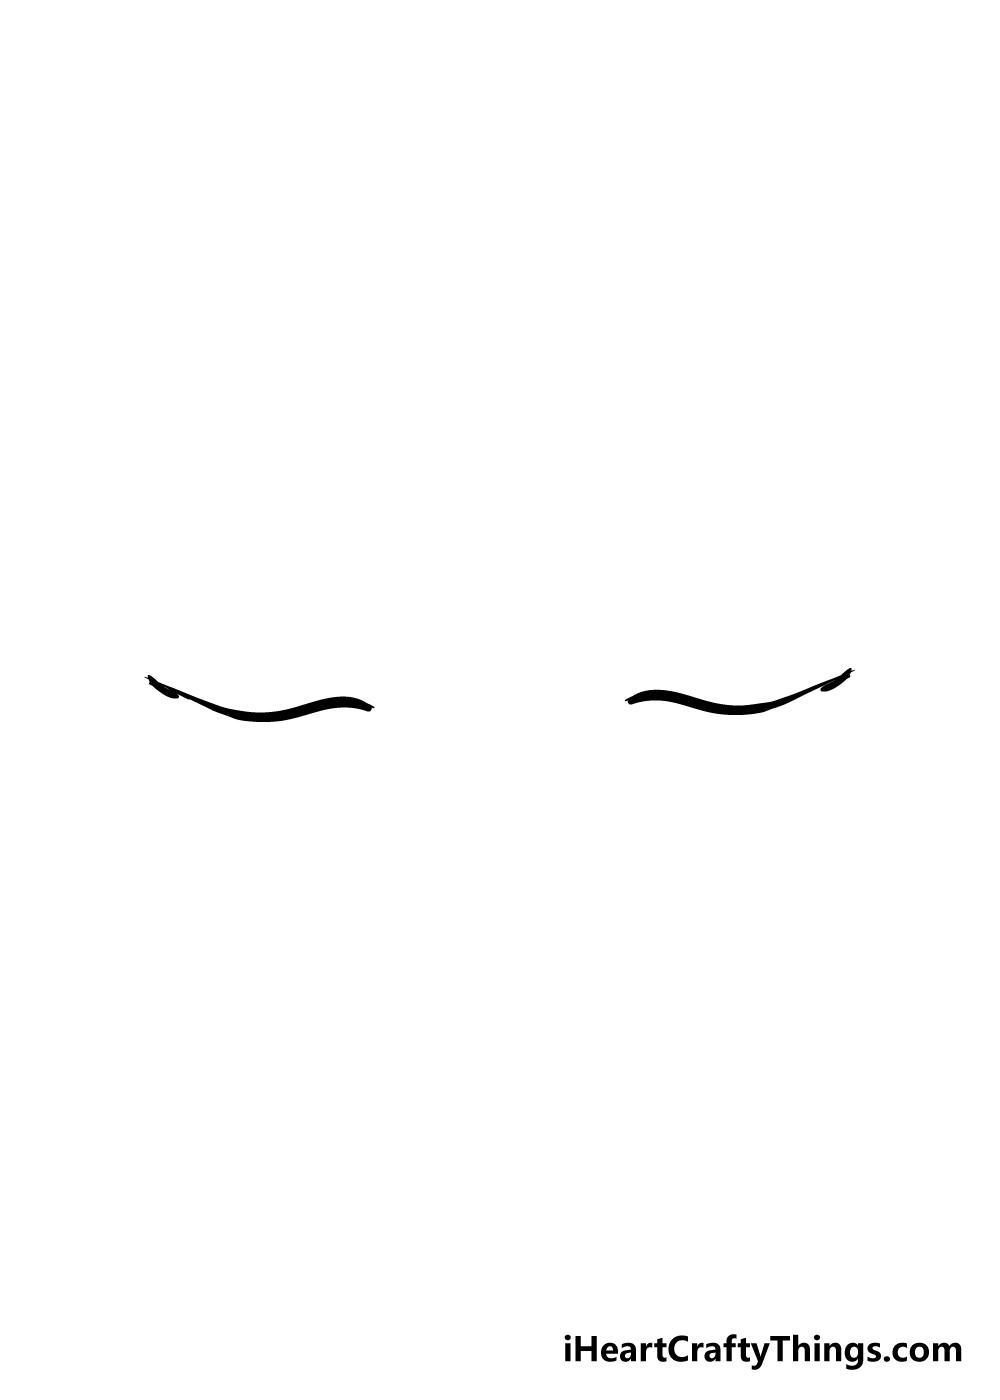 closed eyes drawing step 1